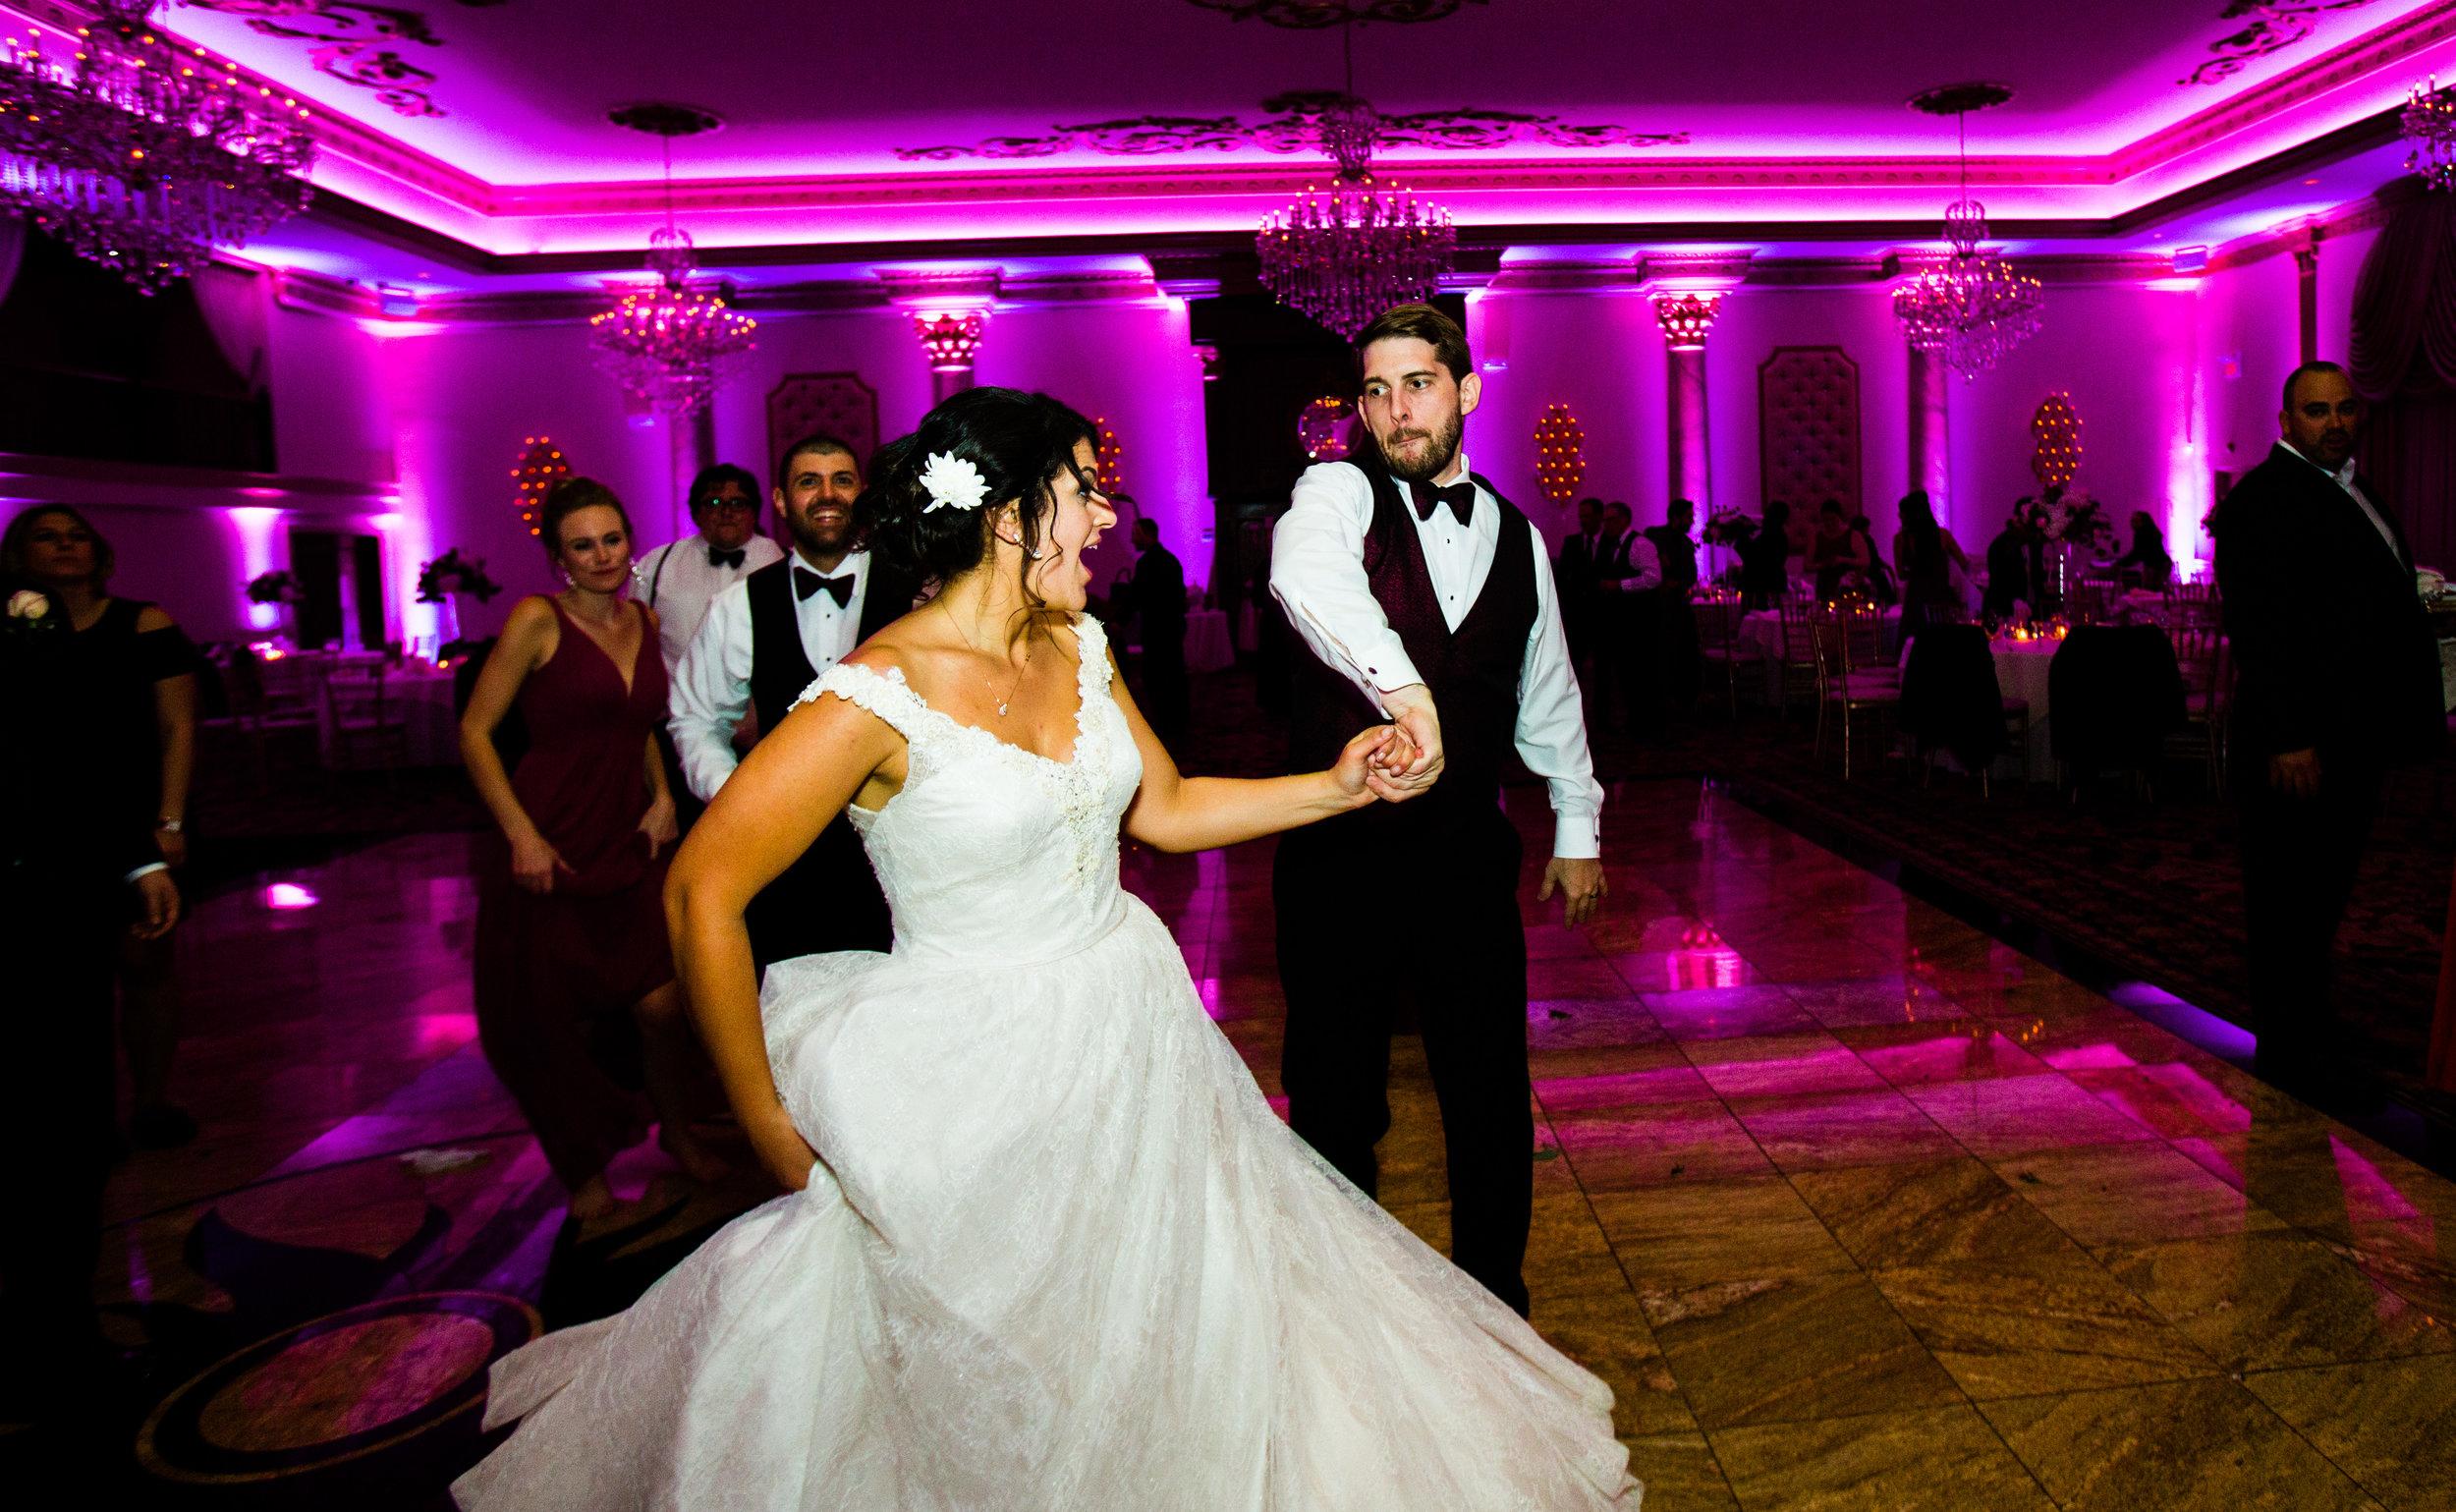 Luciens Manor Wedding Photos - 132.jpg